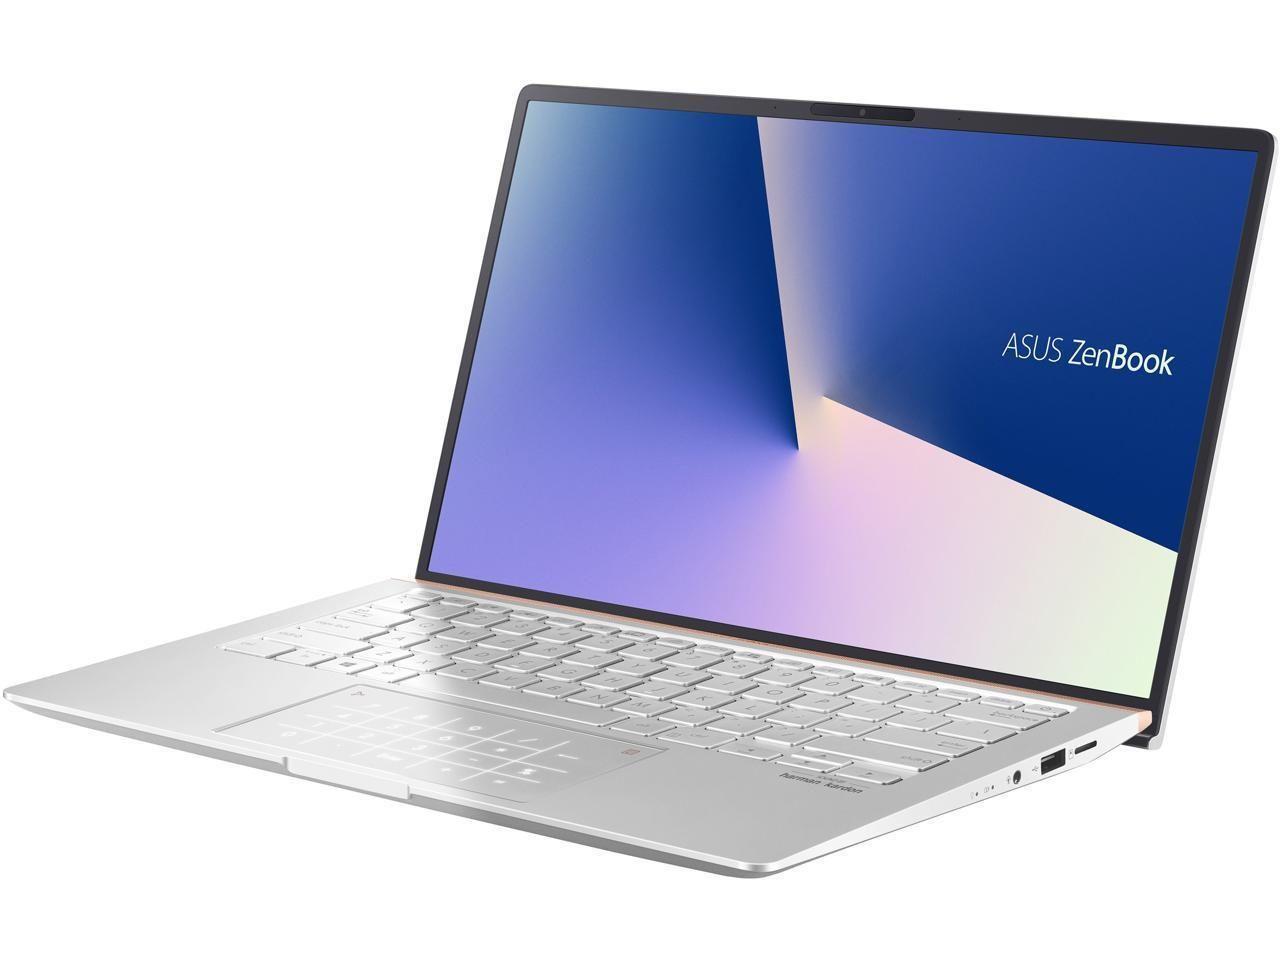 Asus Zenbook 14 Ultra Slim Laptop 14 Full Hd 4 Way Nanoedge Bezel Amd R7 3700u Cpu 8 Gb Ram 1 Tb Asus Ssd Laptop